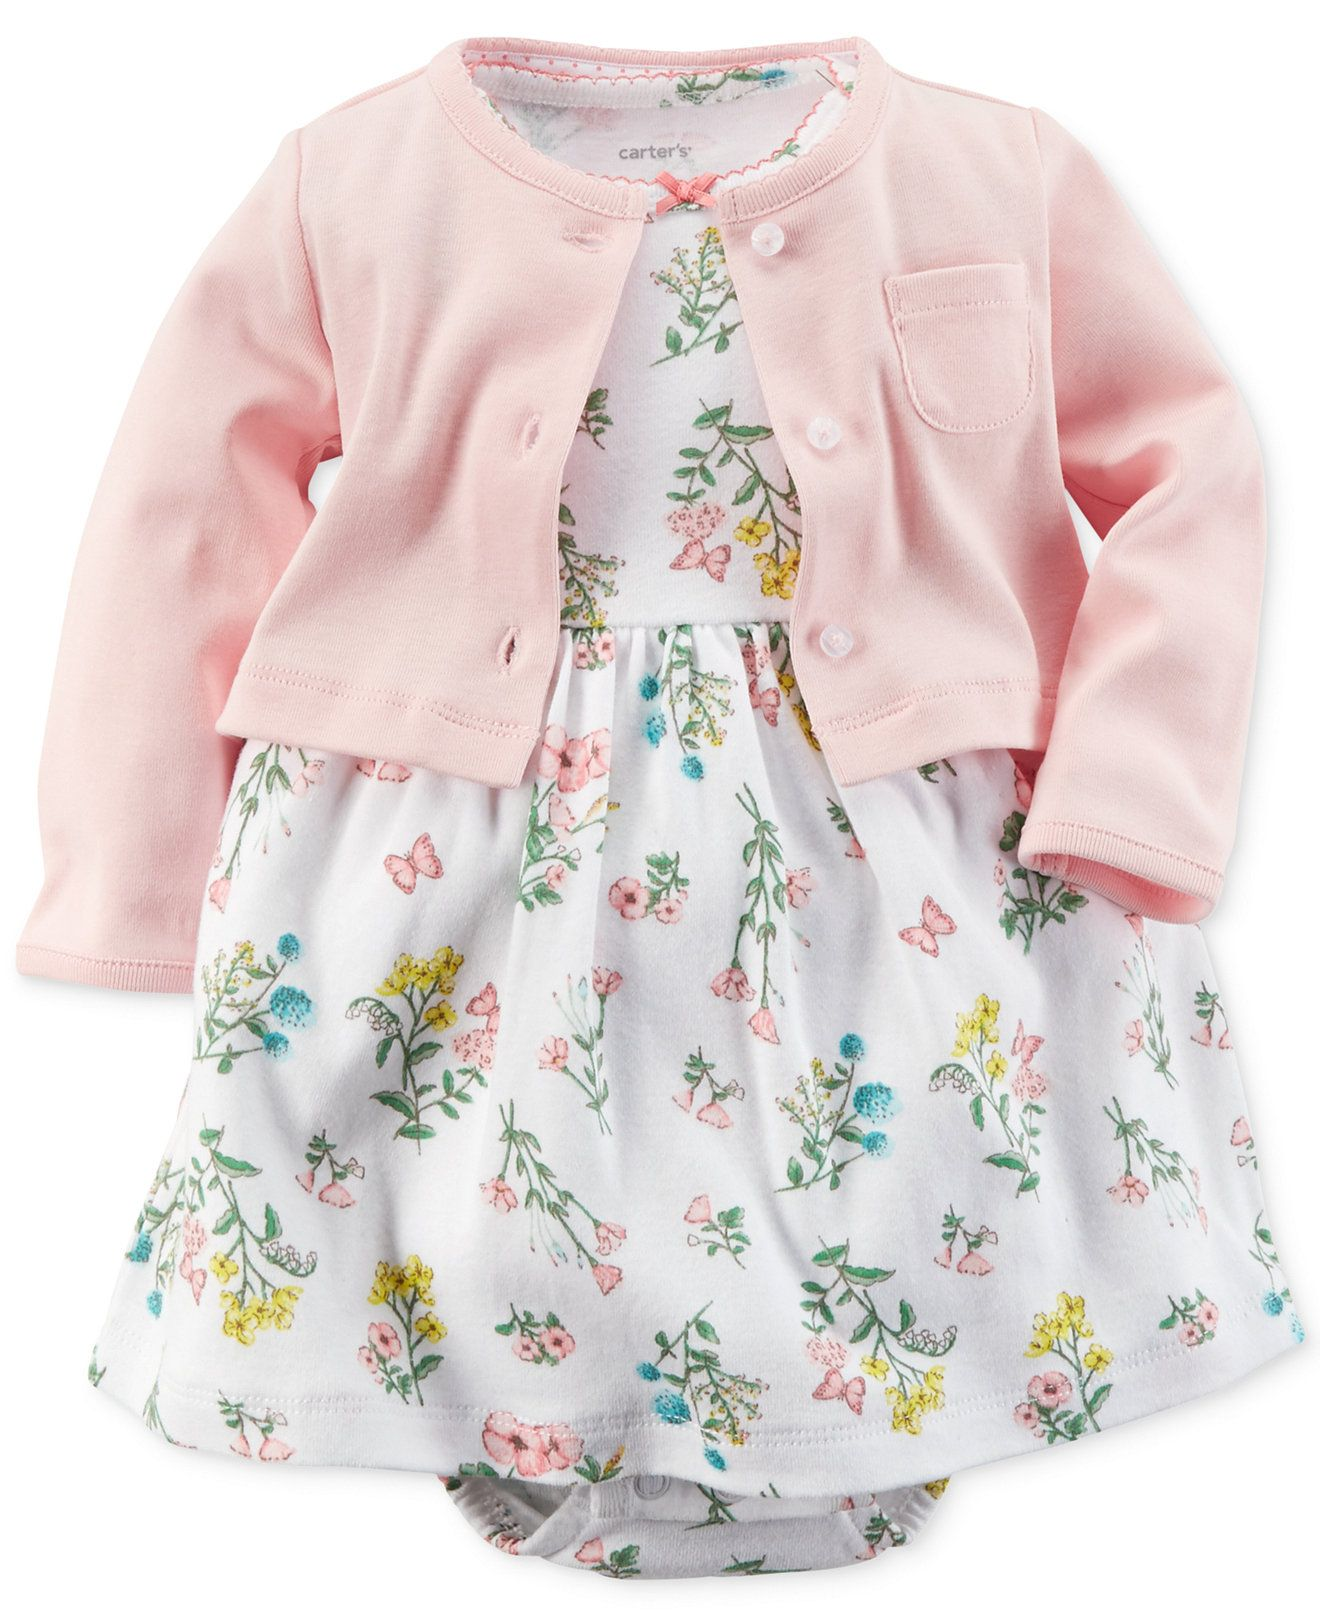 cb76f25fb Carter s Baby Girls  2-Piece Cardigan   Floral Dress Set - Kids ...